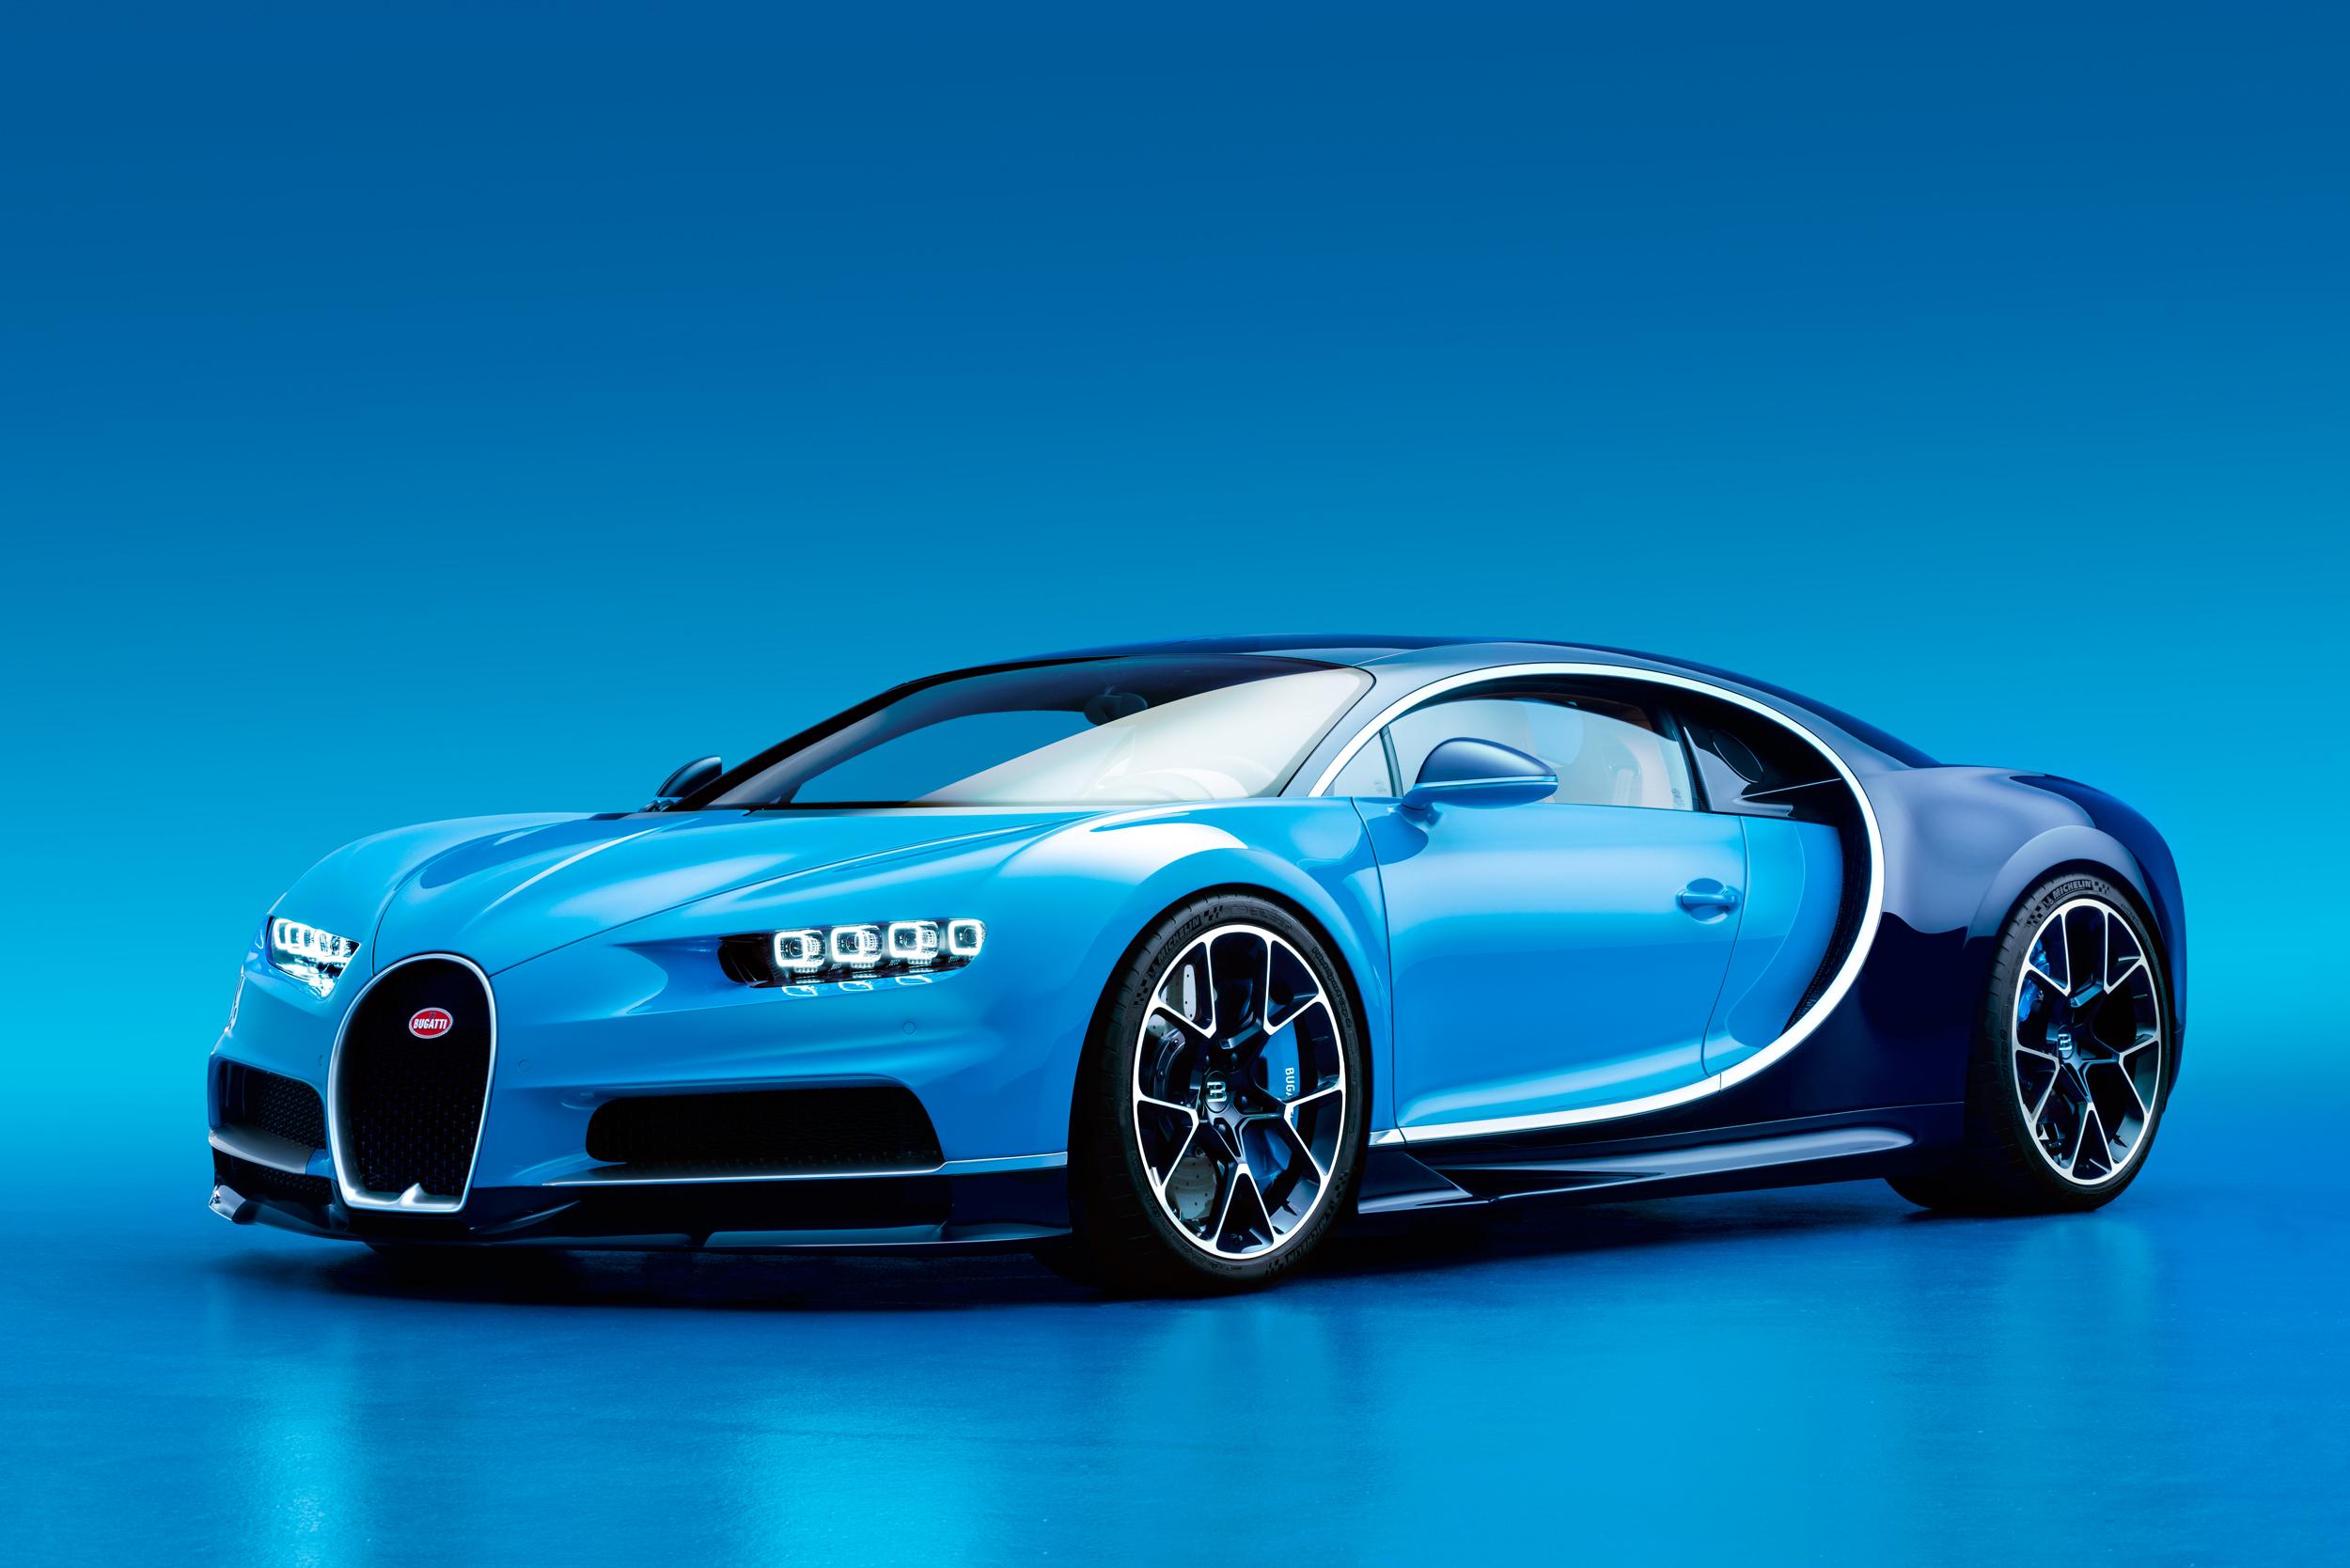 Parmigiani Fleurier – Bugatti 390 Concept Watch